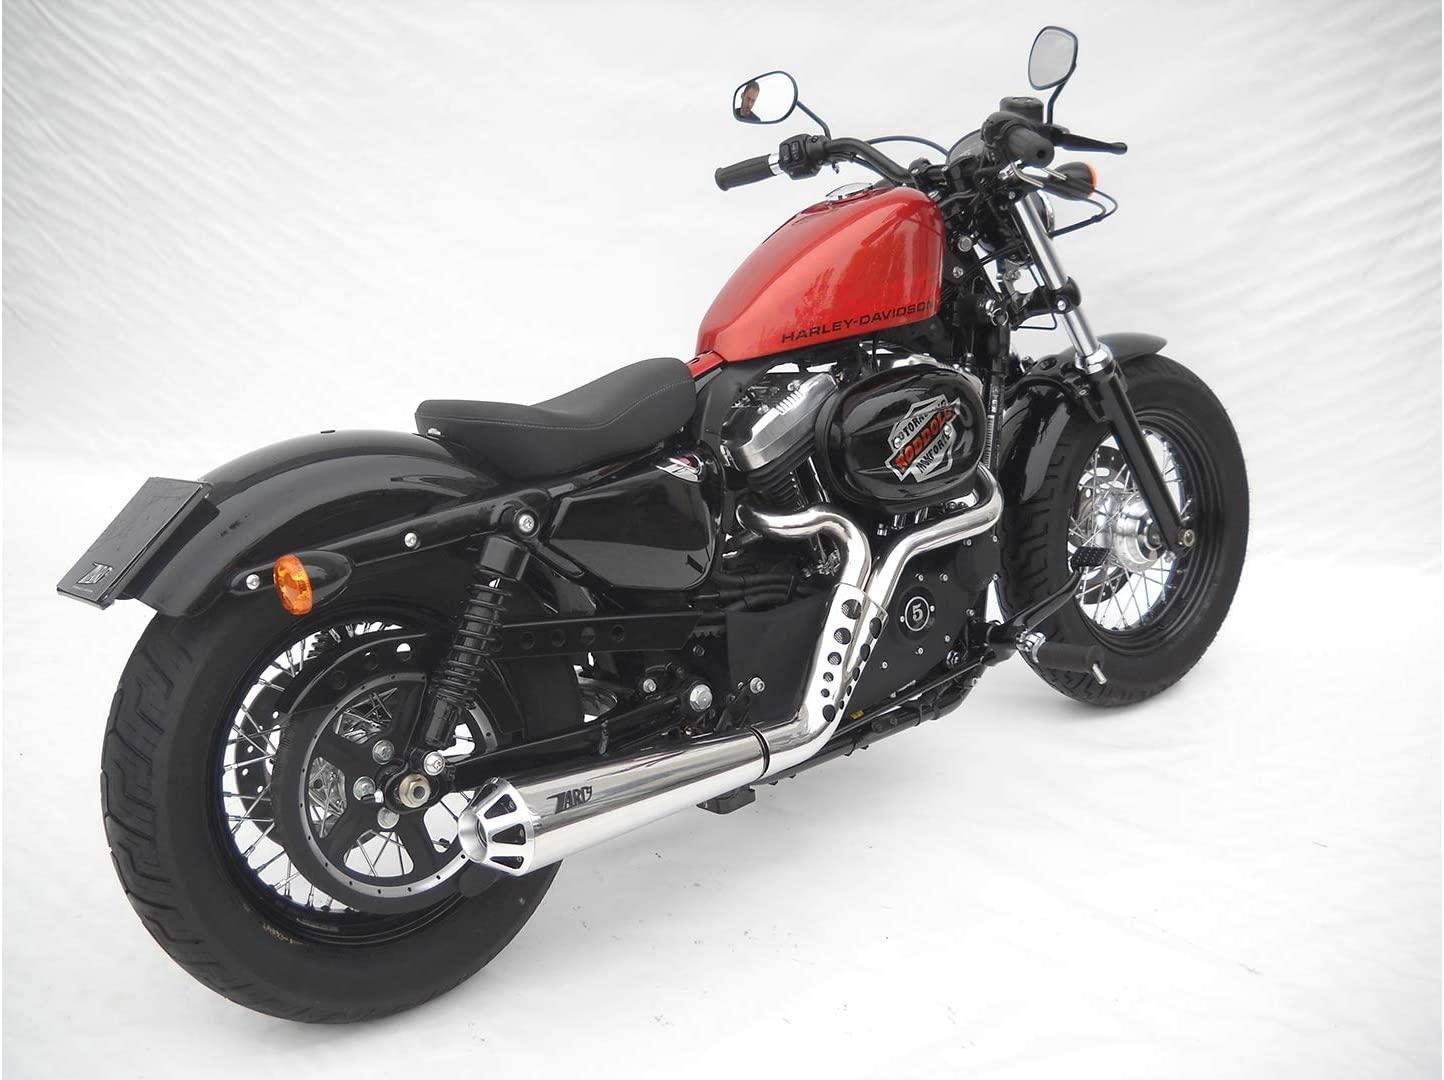 Motorize ZARD Complete System Harley-Davidson Sportster, 04-13, Stainless Steel, cat.